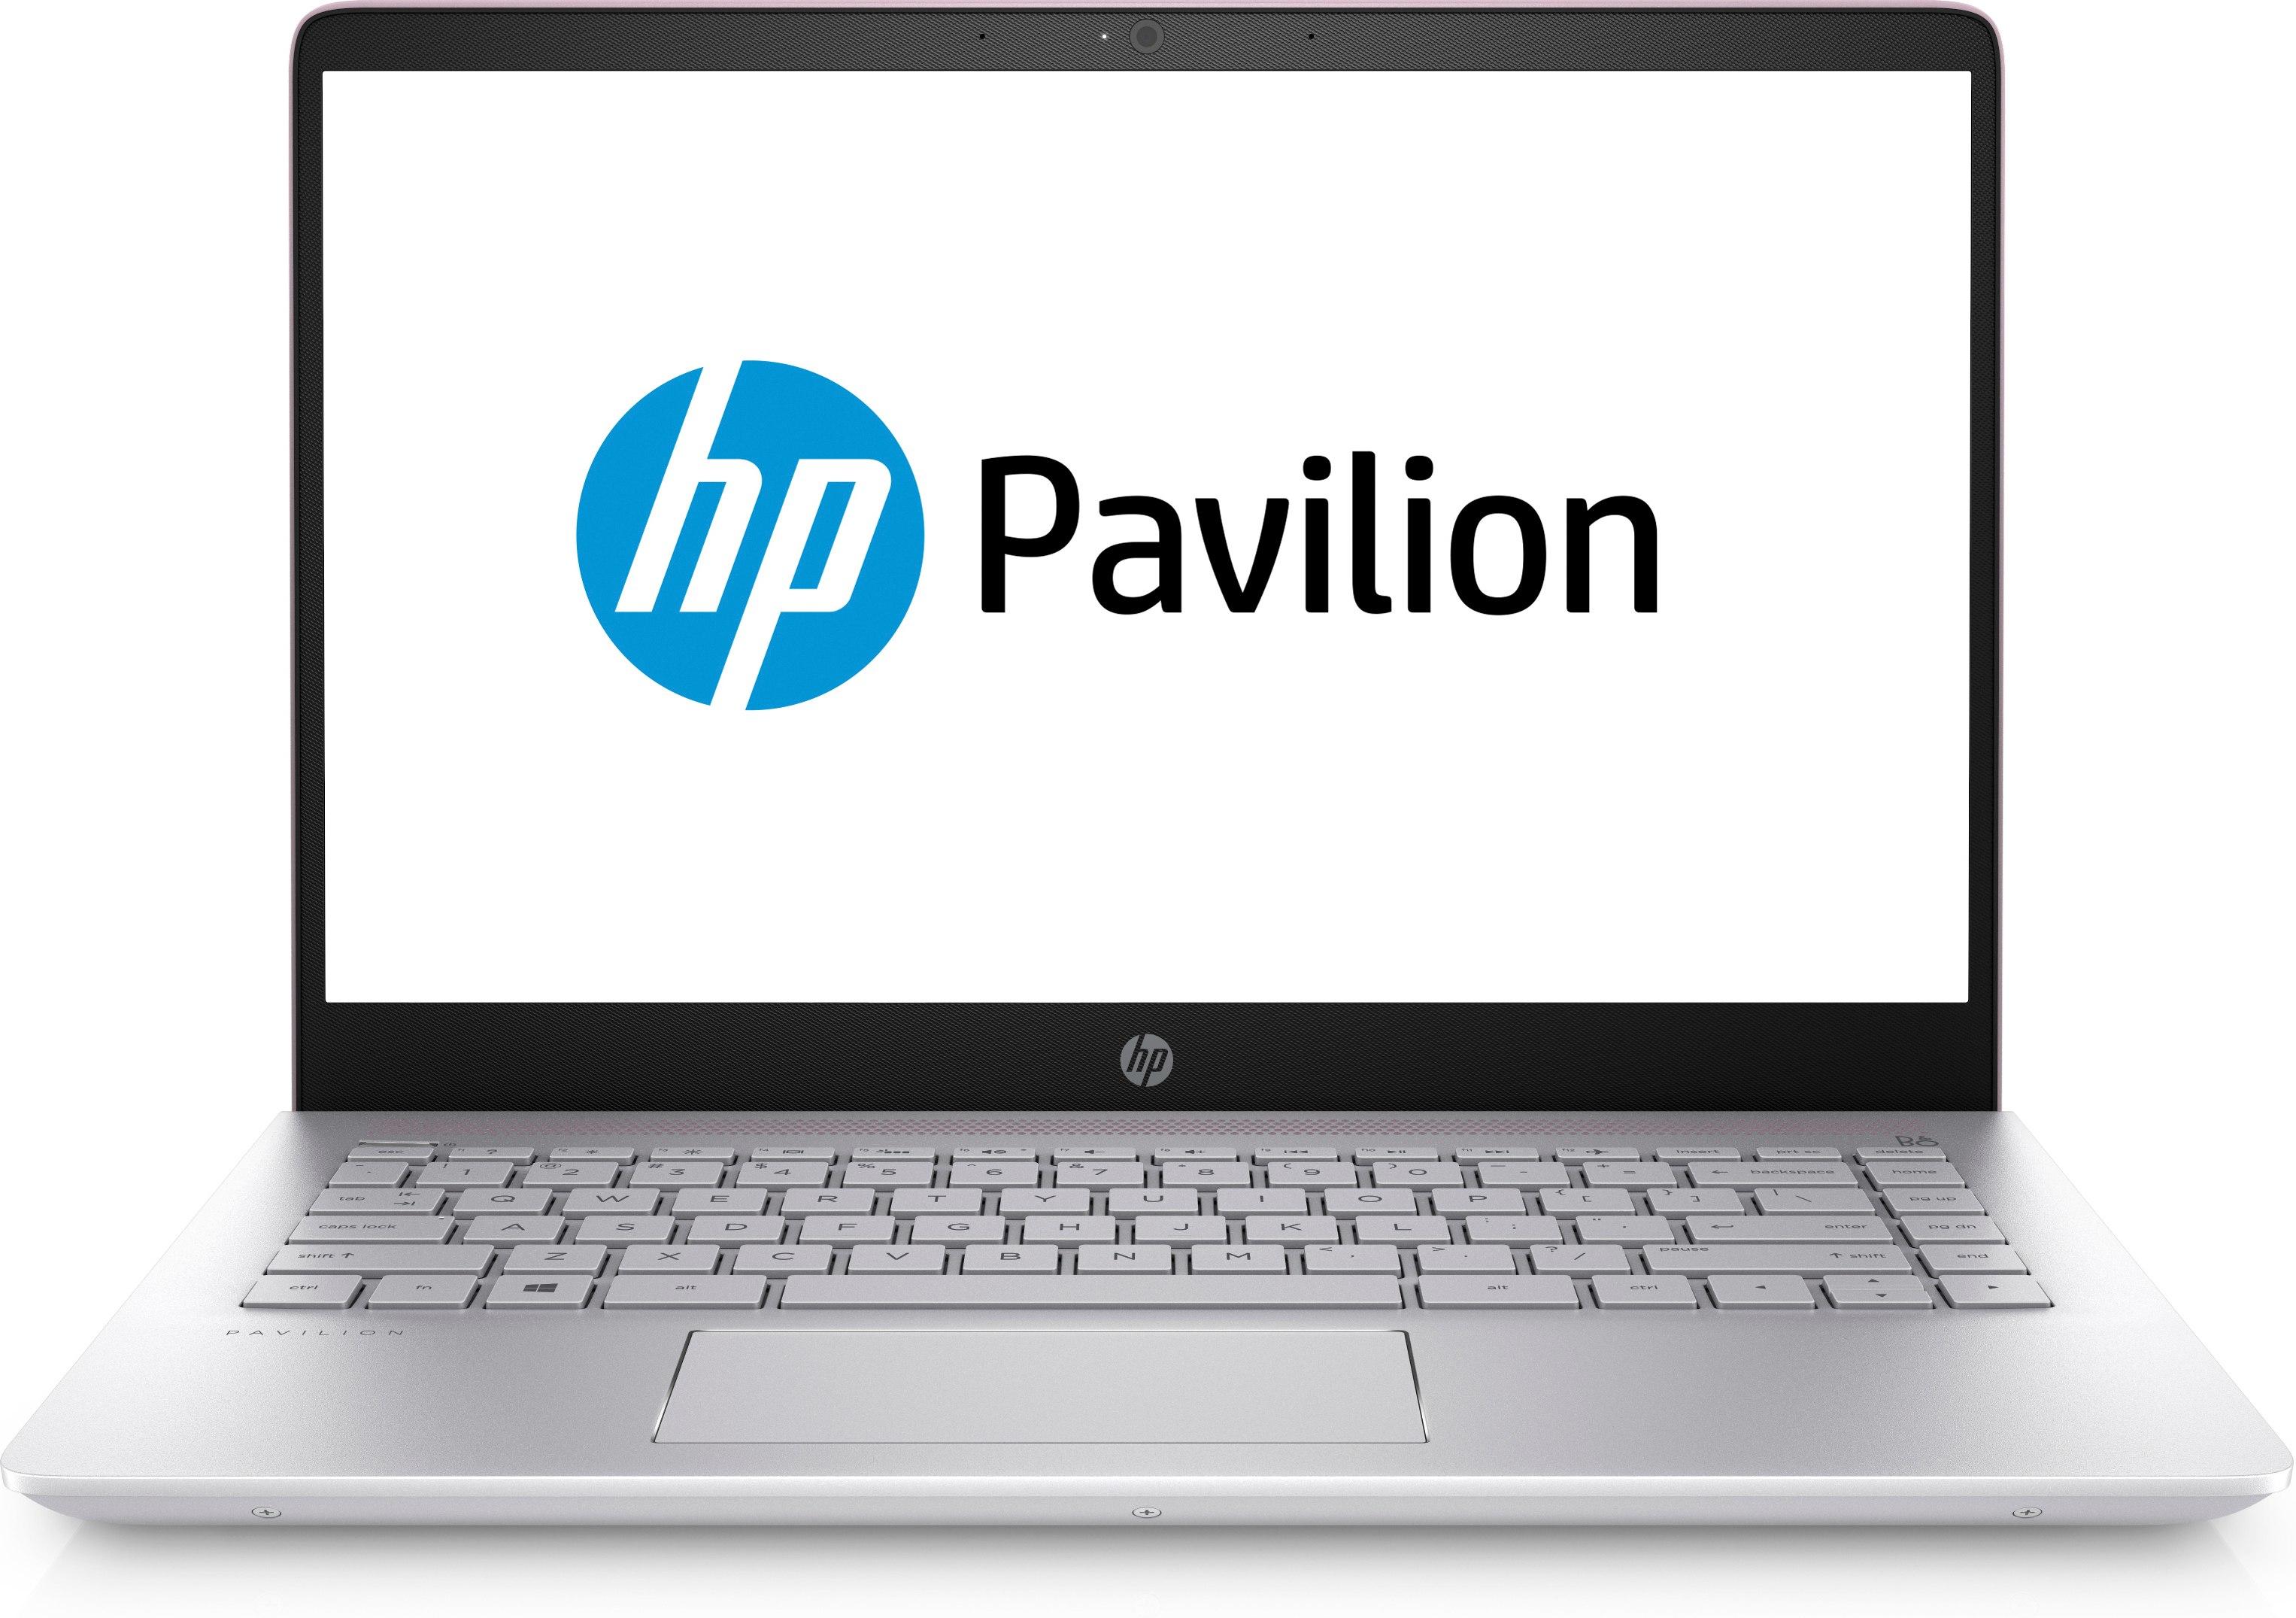 Hewlett Packard HP Pavilion 14 bf005ng 35 6 cm 14 Zoll